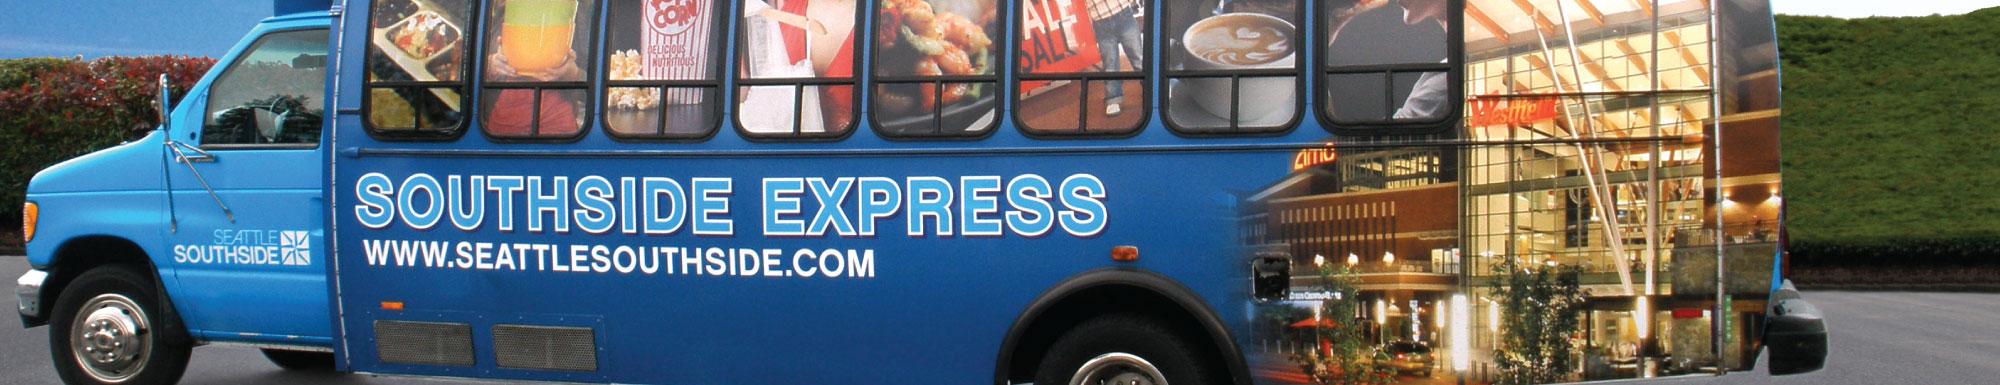 Southside Express